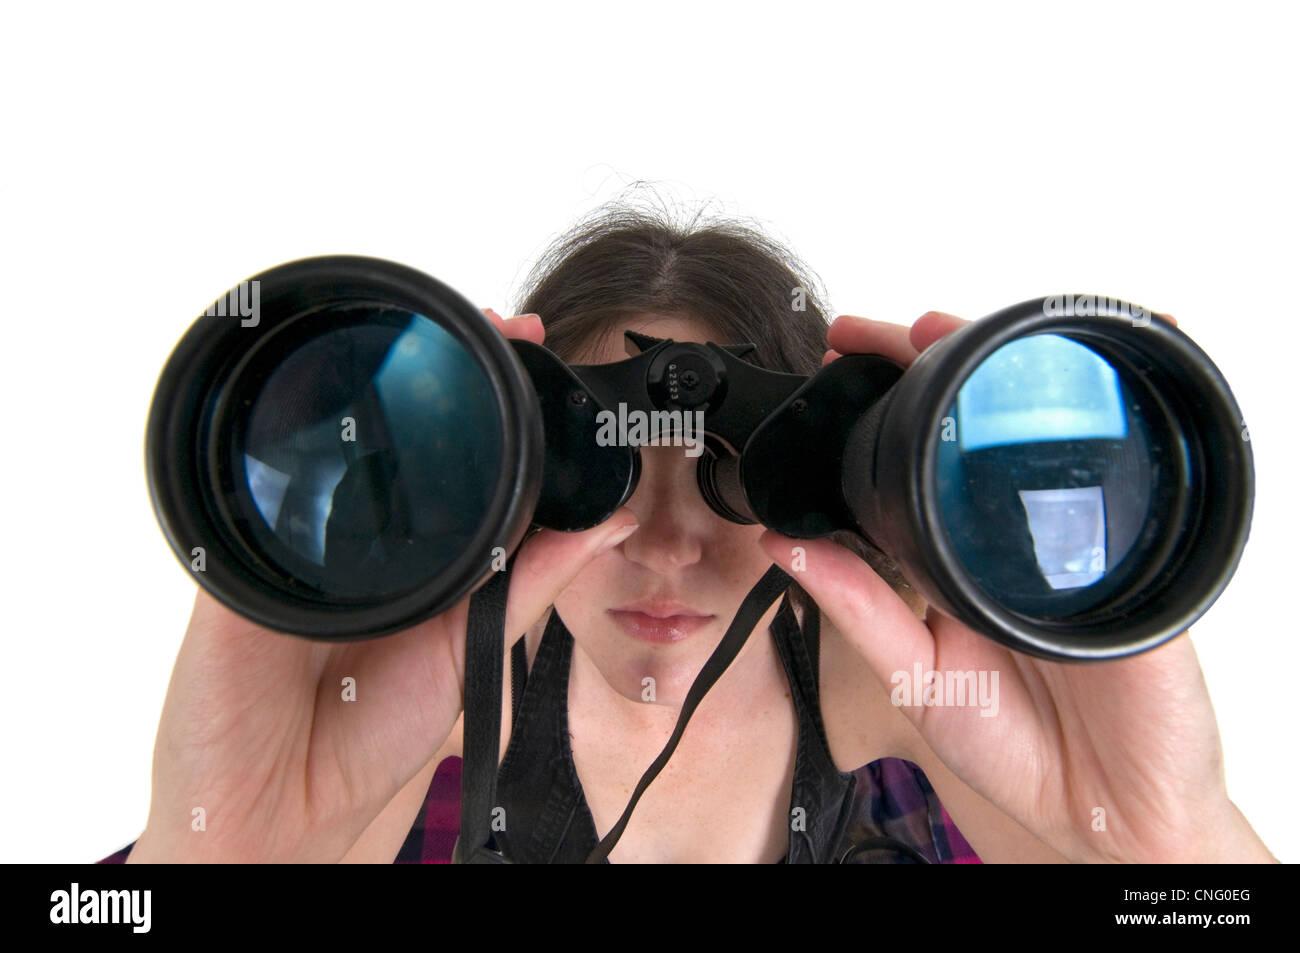 Frau mit dem Fernglas Stockbild